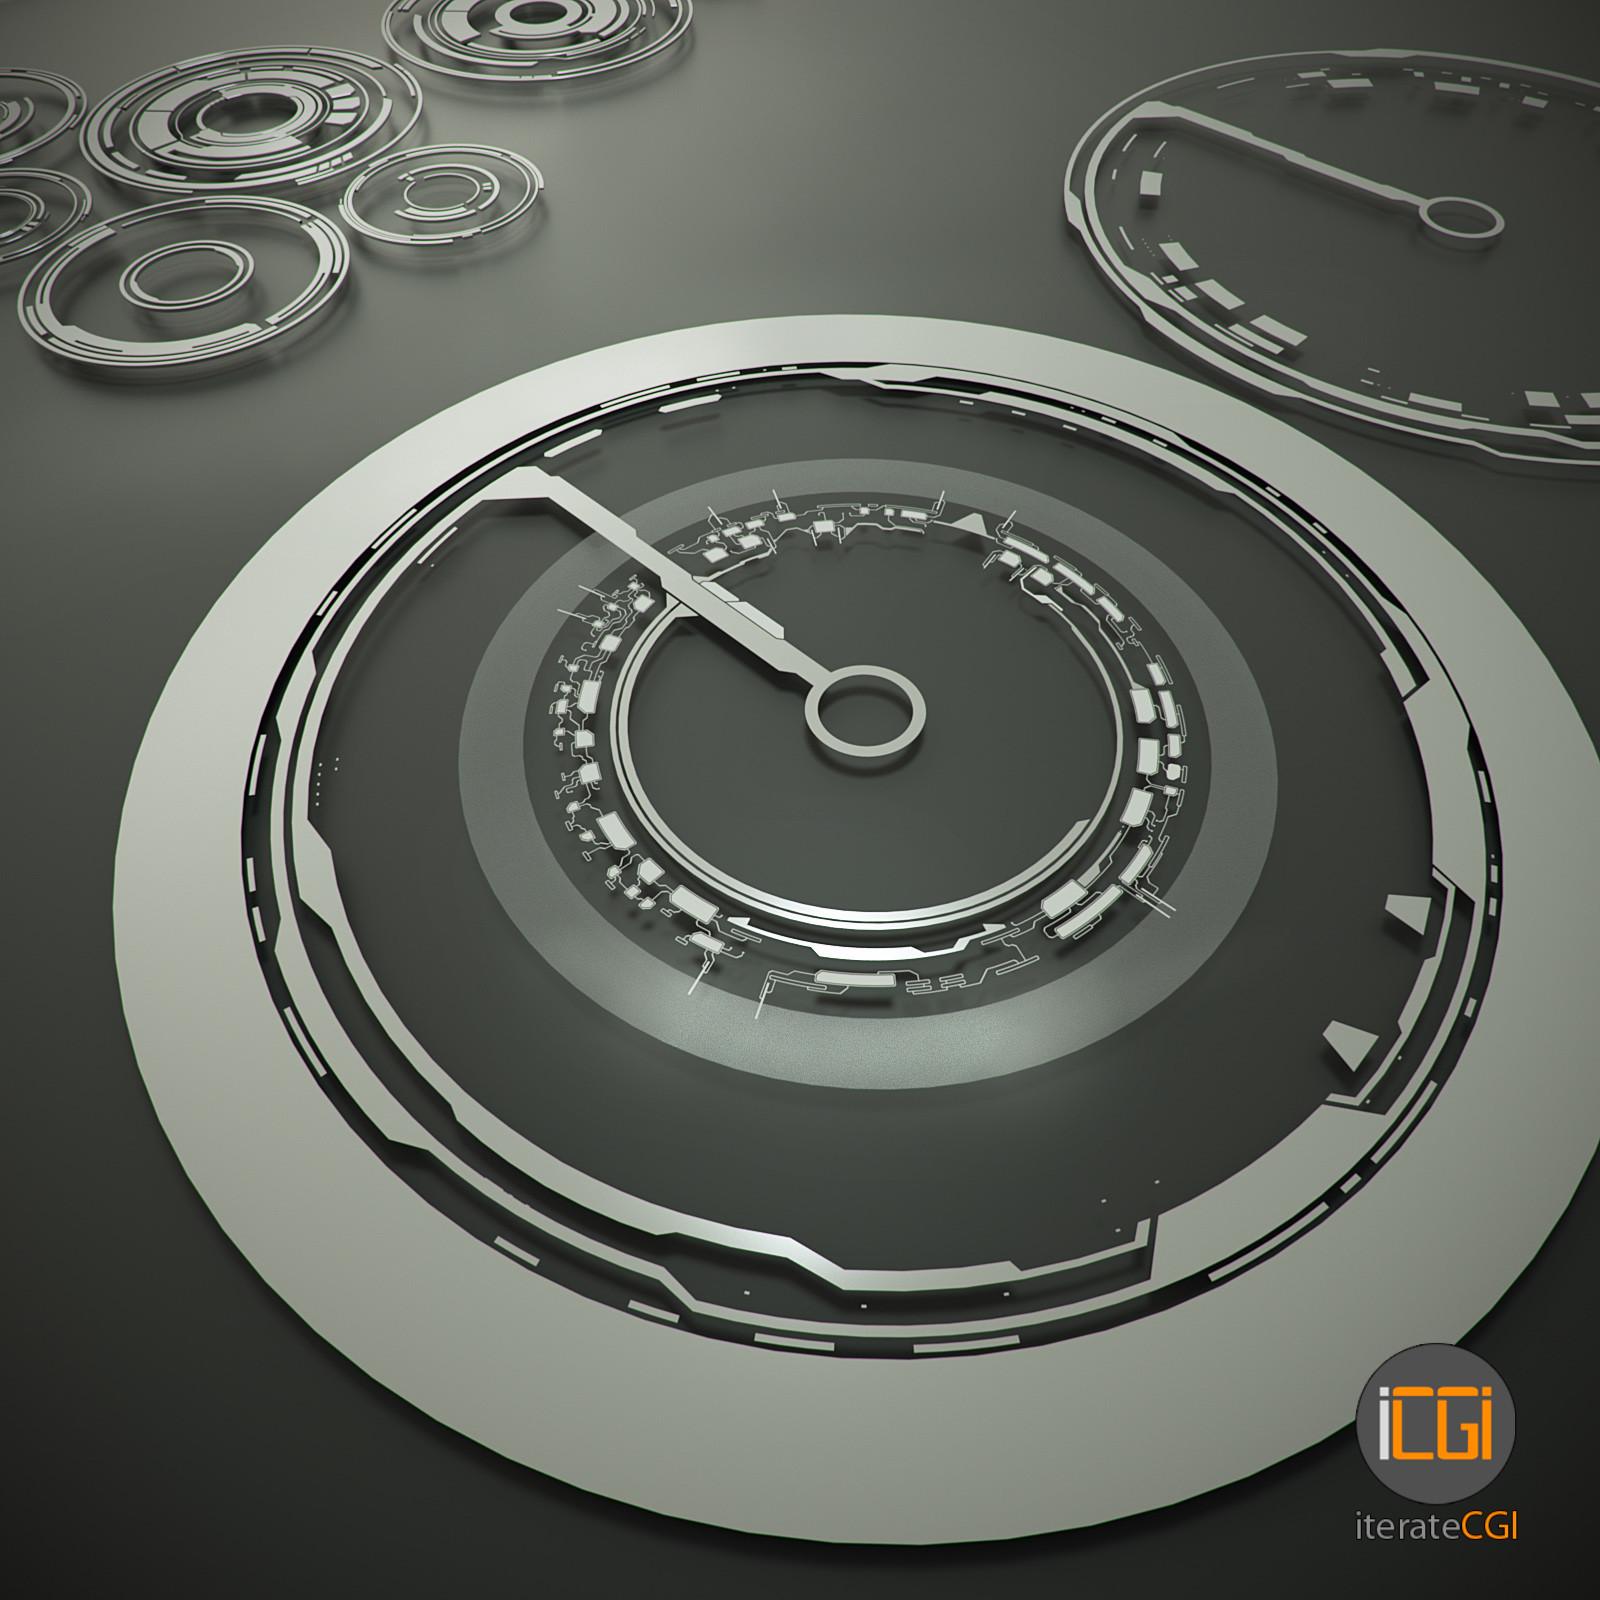 Johan de leenheer tech circles 3 66